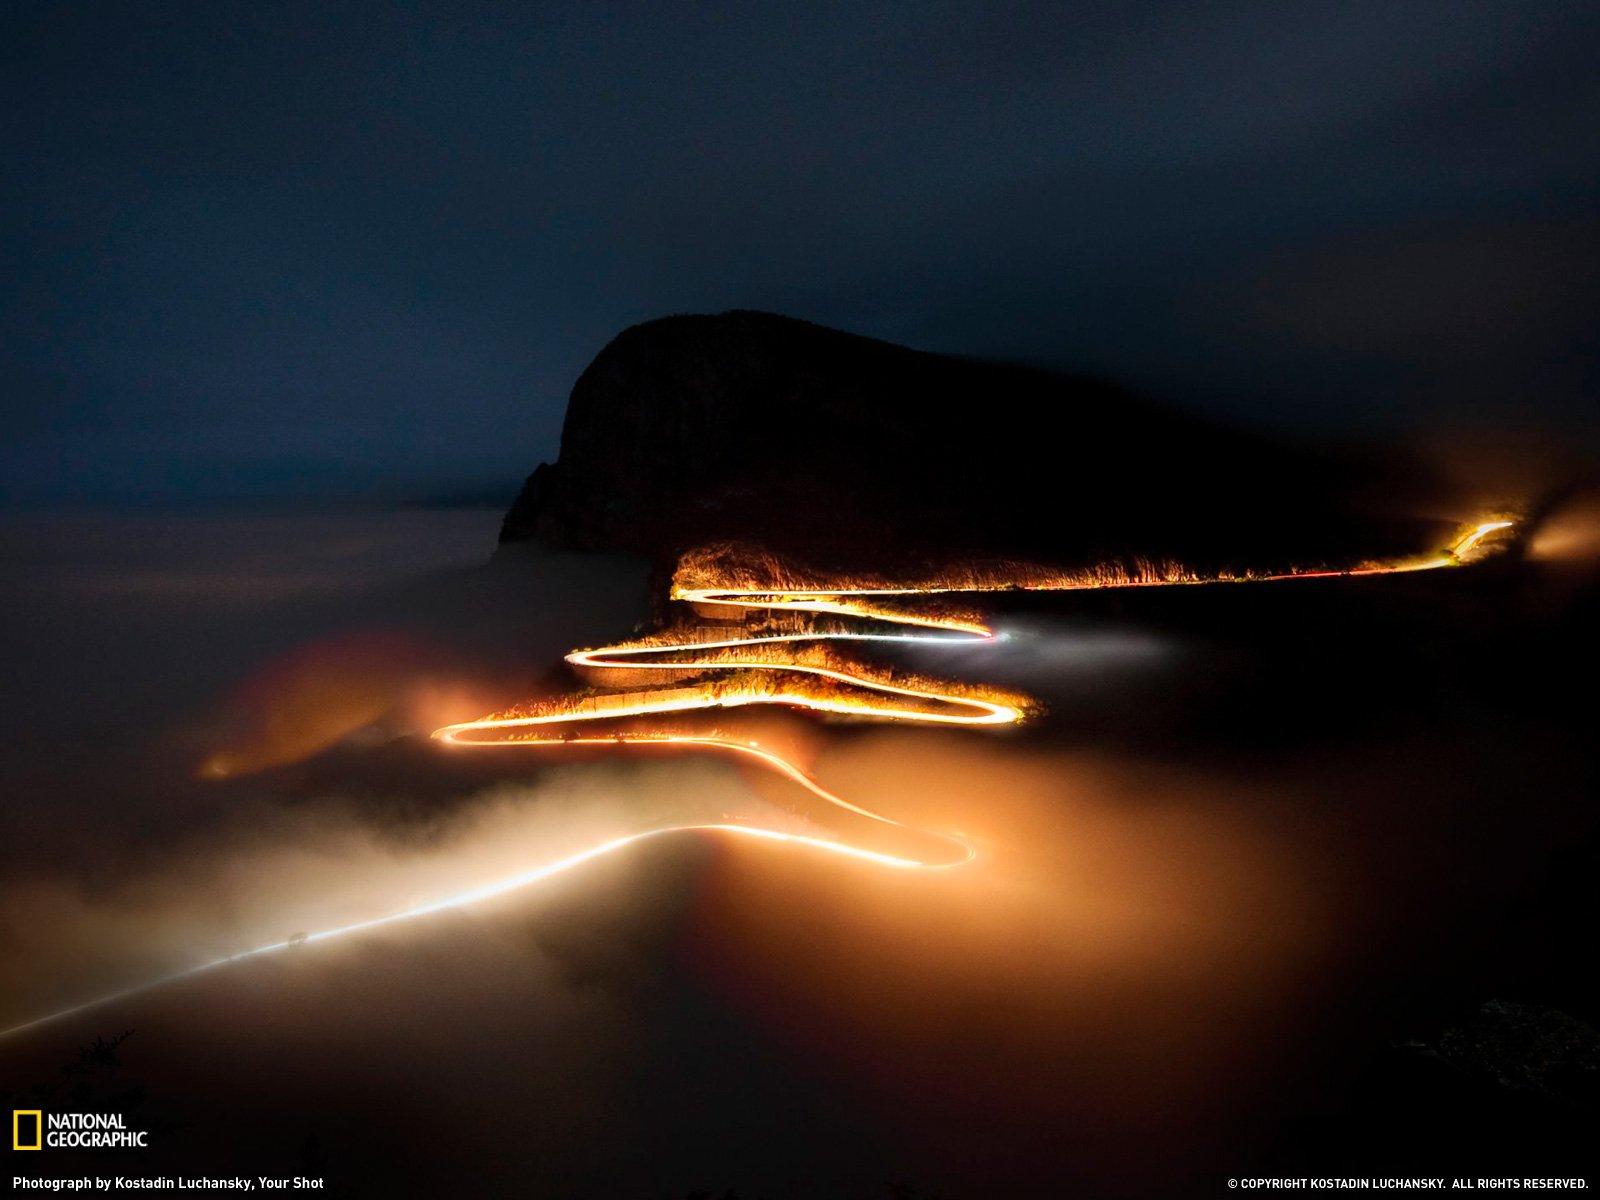 Leba Photo Angola Wallpaper National Geographic Photo of the Day 1600x1200